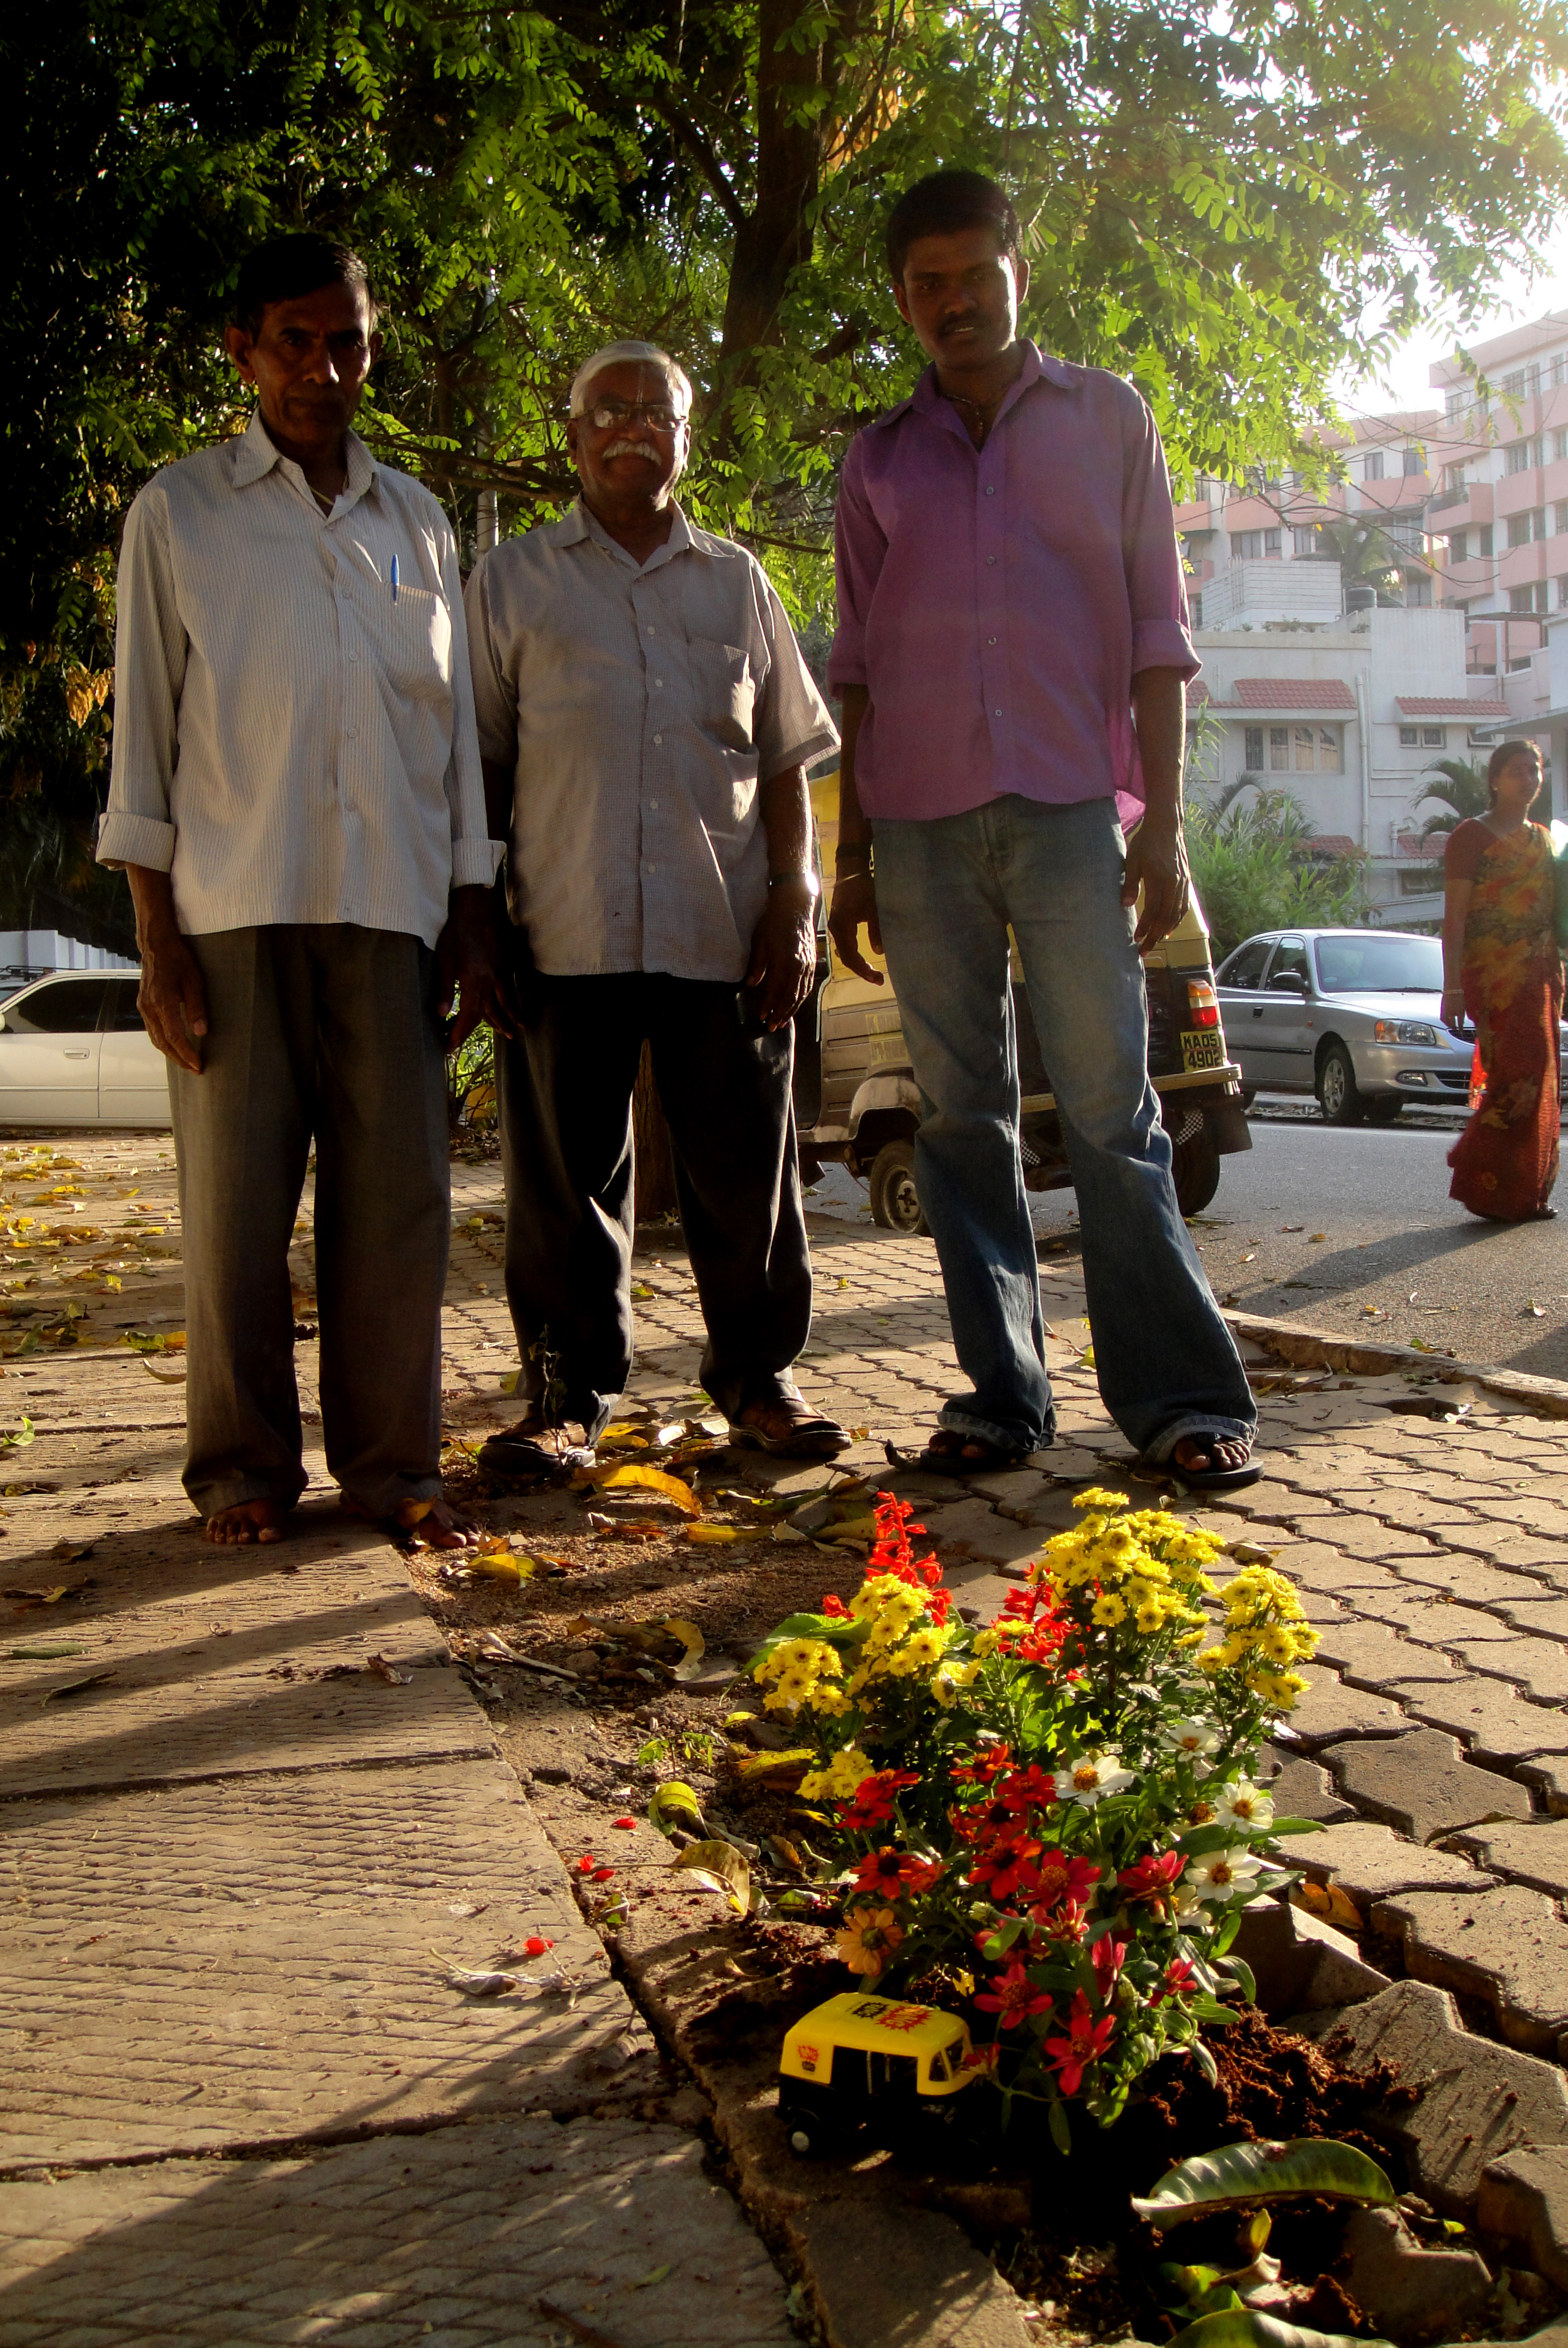 Gardening in India | the pothole gardener